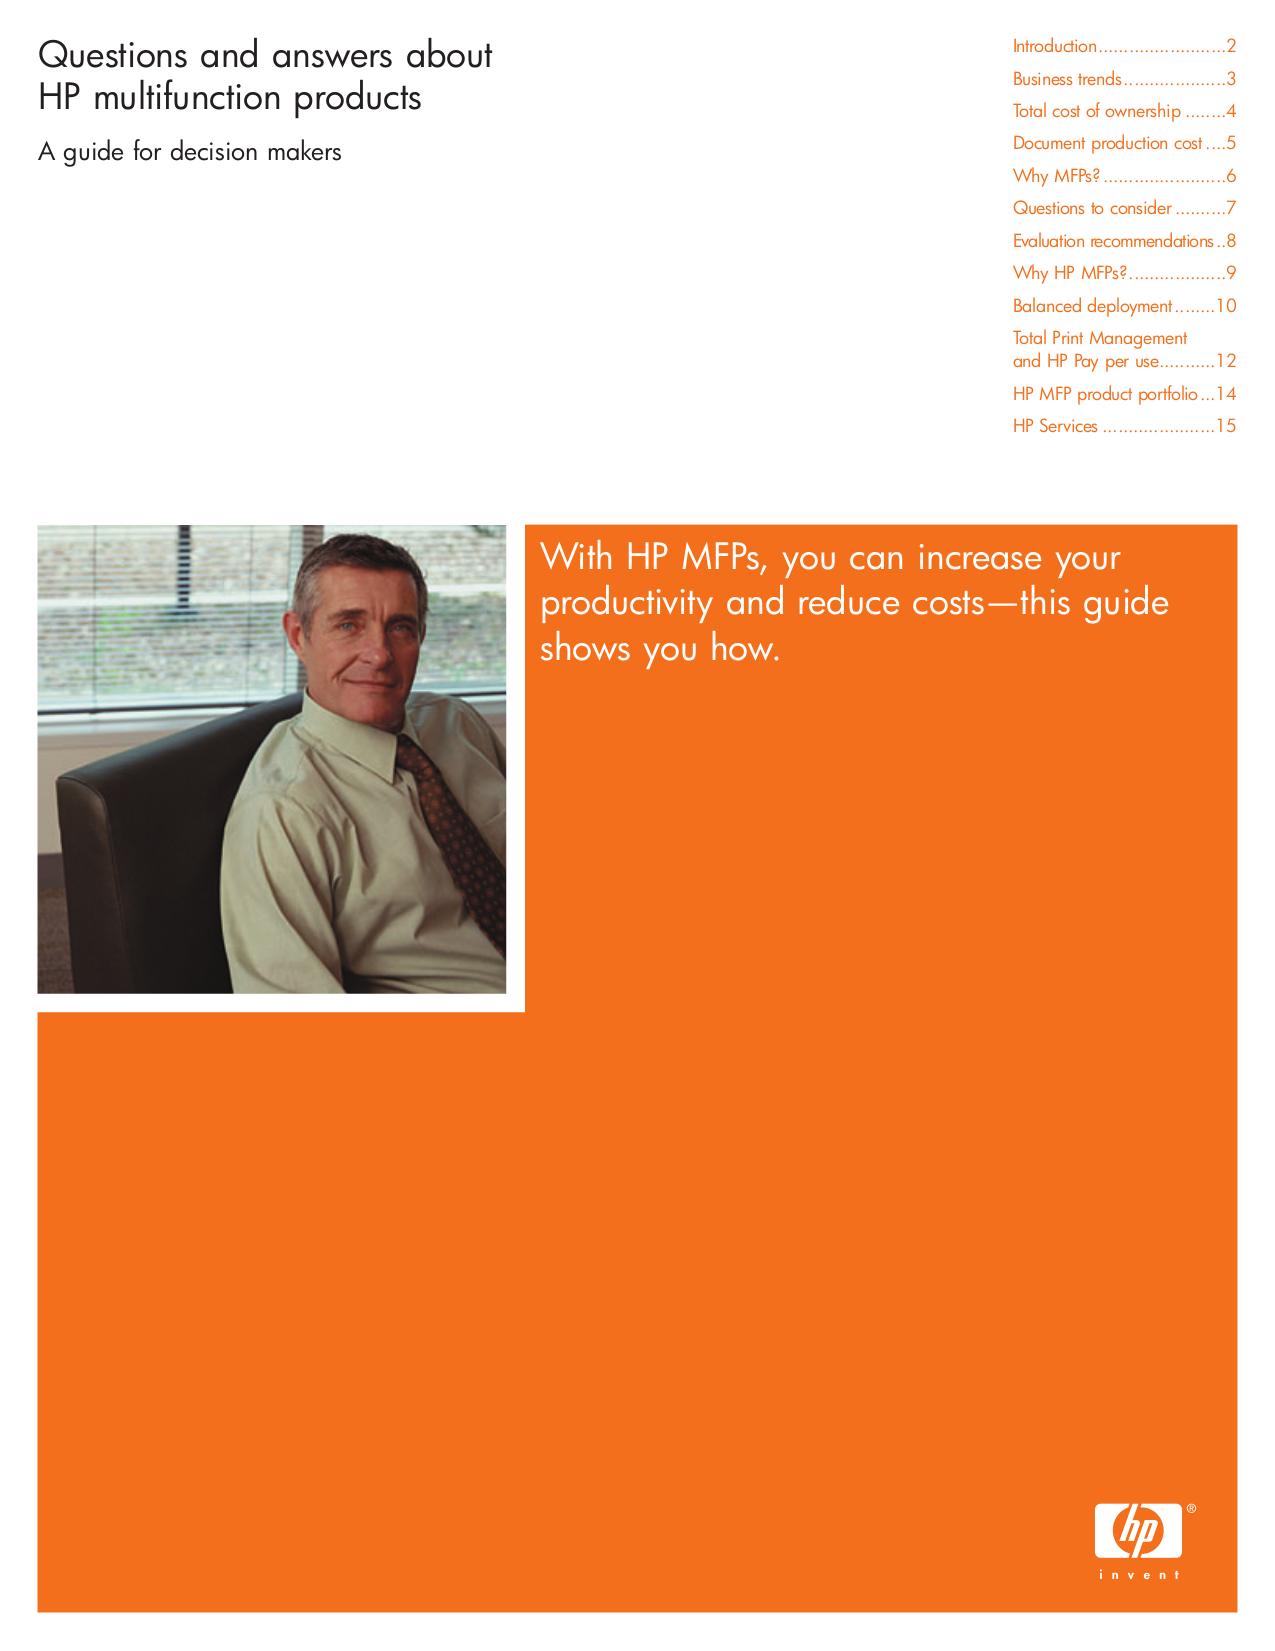 pdf for HP Multifunction Printer Laserjet,Color Laserjet 4100 MFP manual